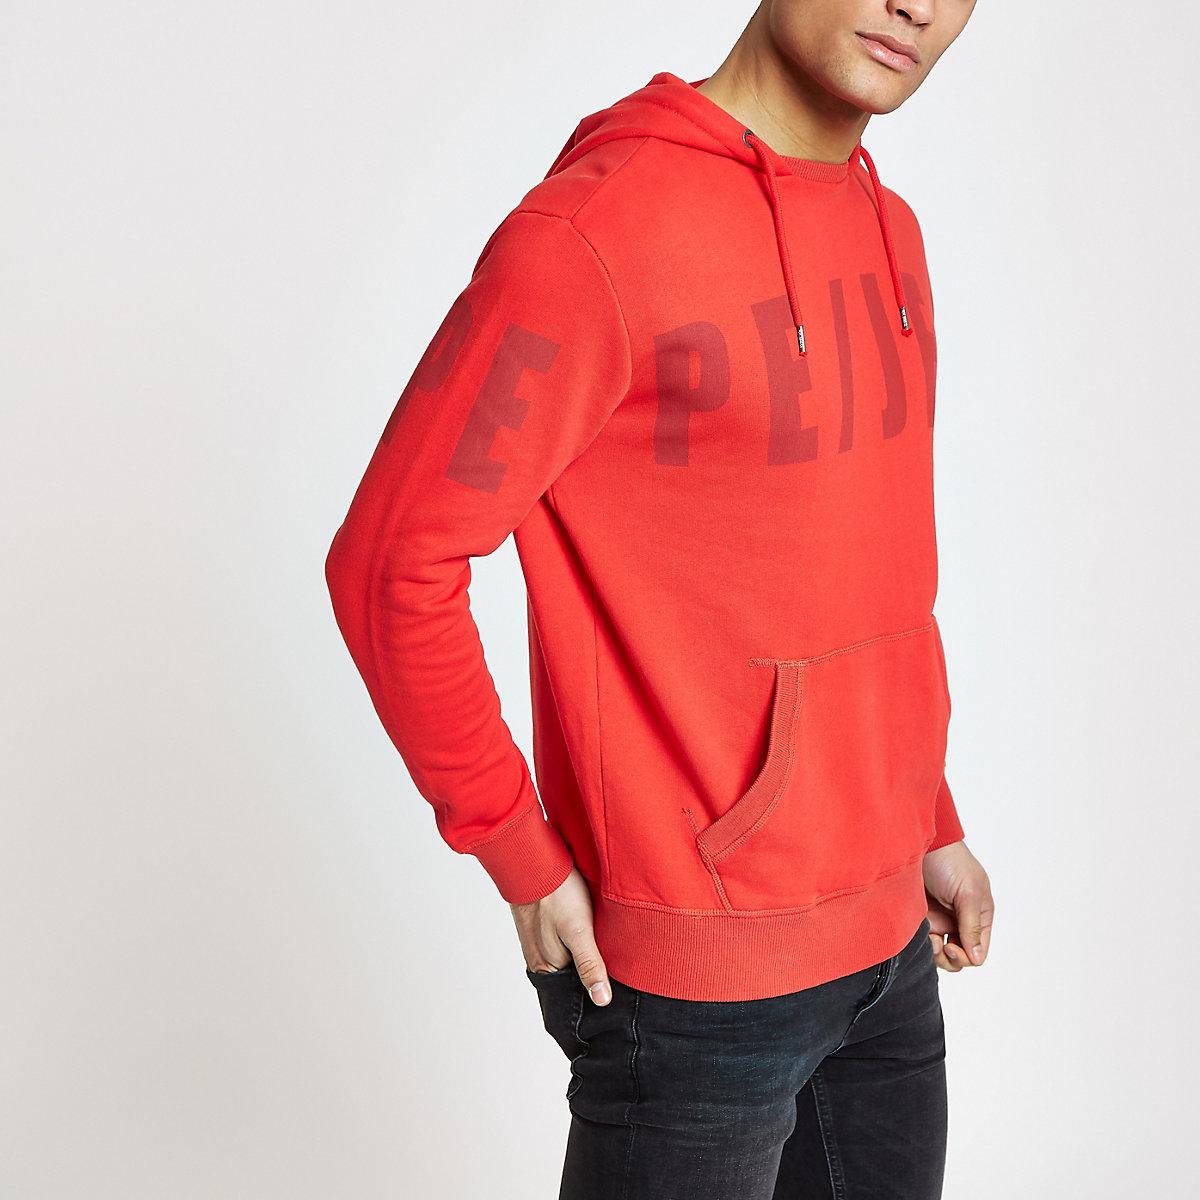 Pepe Jeans red logo hoodie